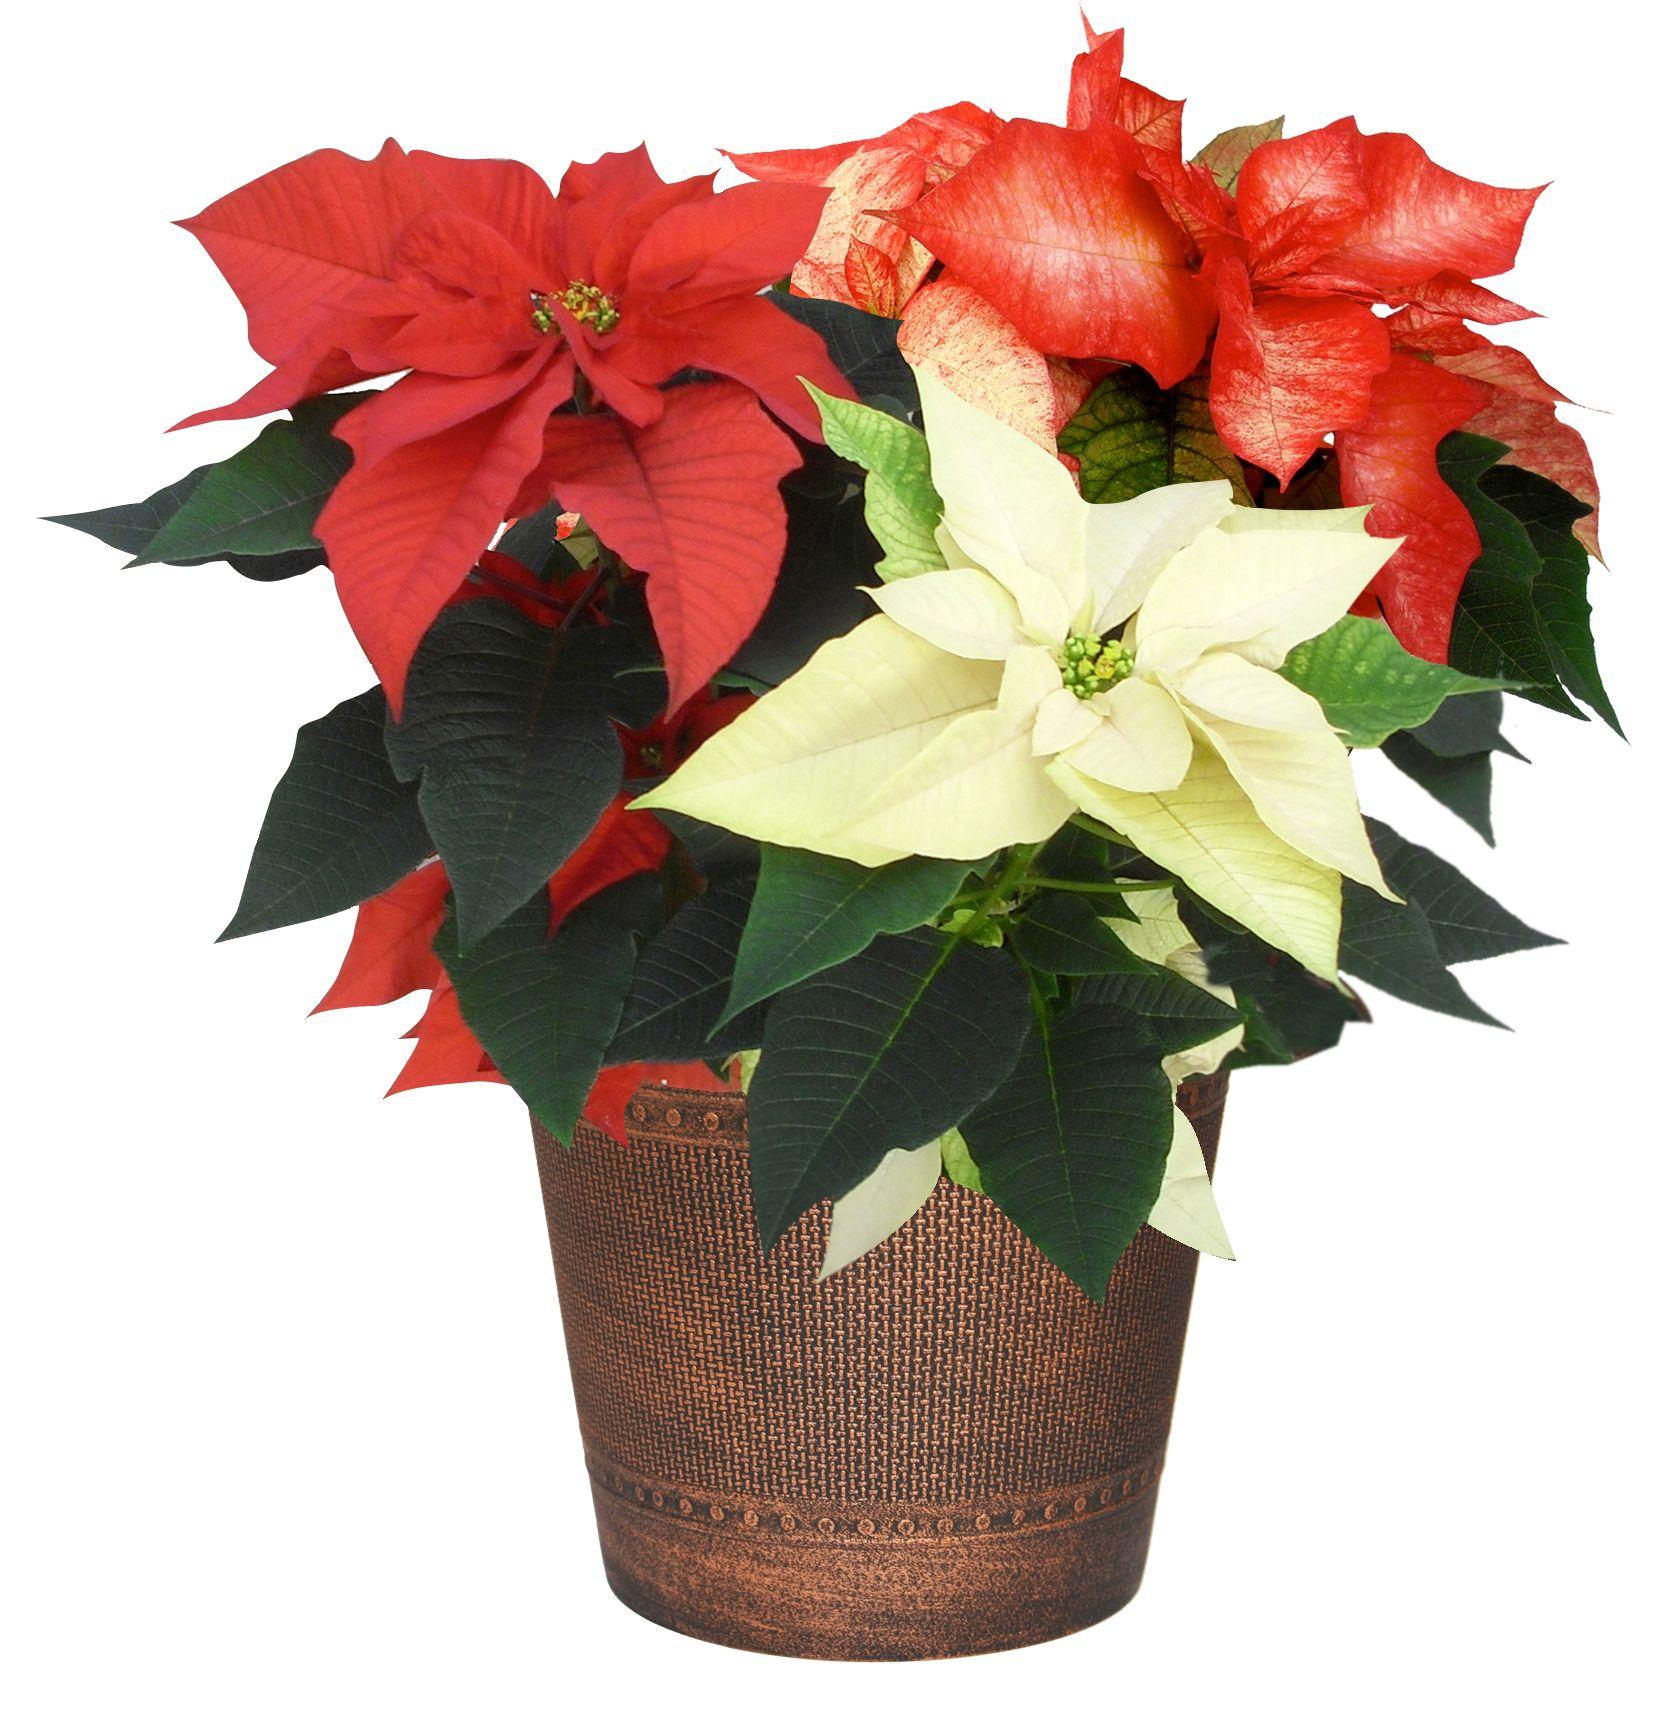 Tri-color poinsettia | Holiday Plants & Decorating | Pinterest | Plants